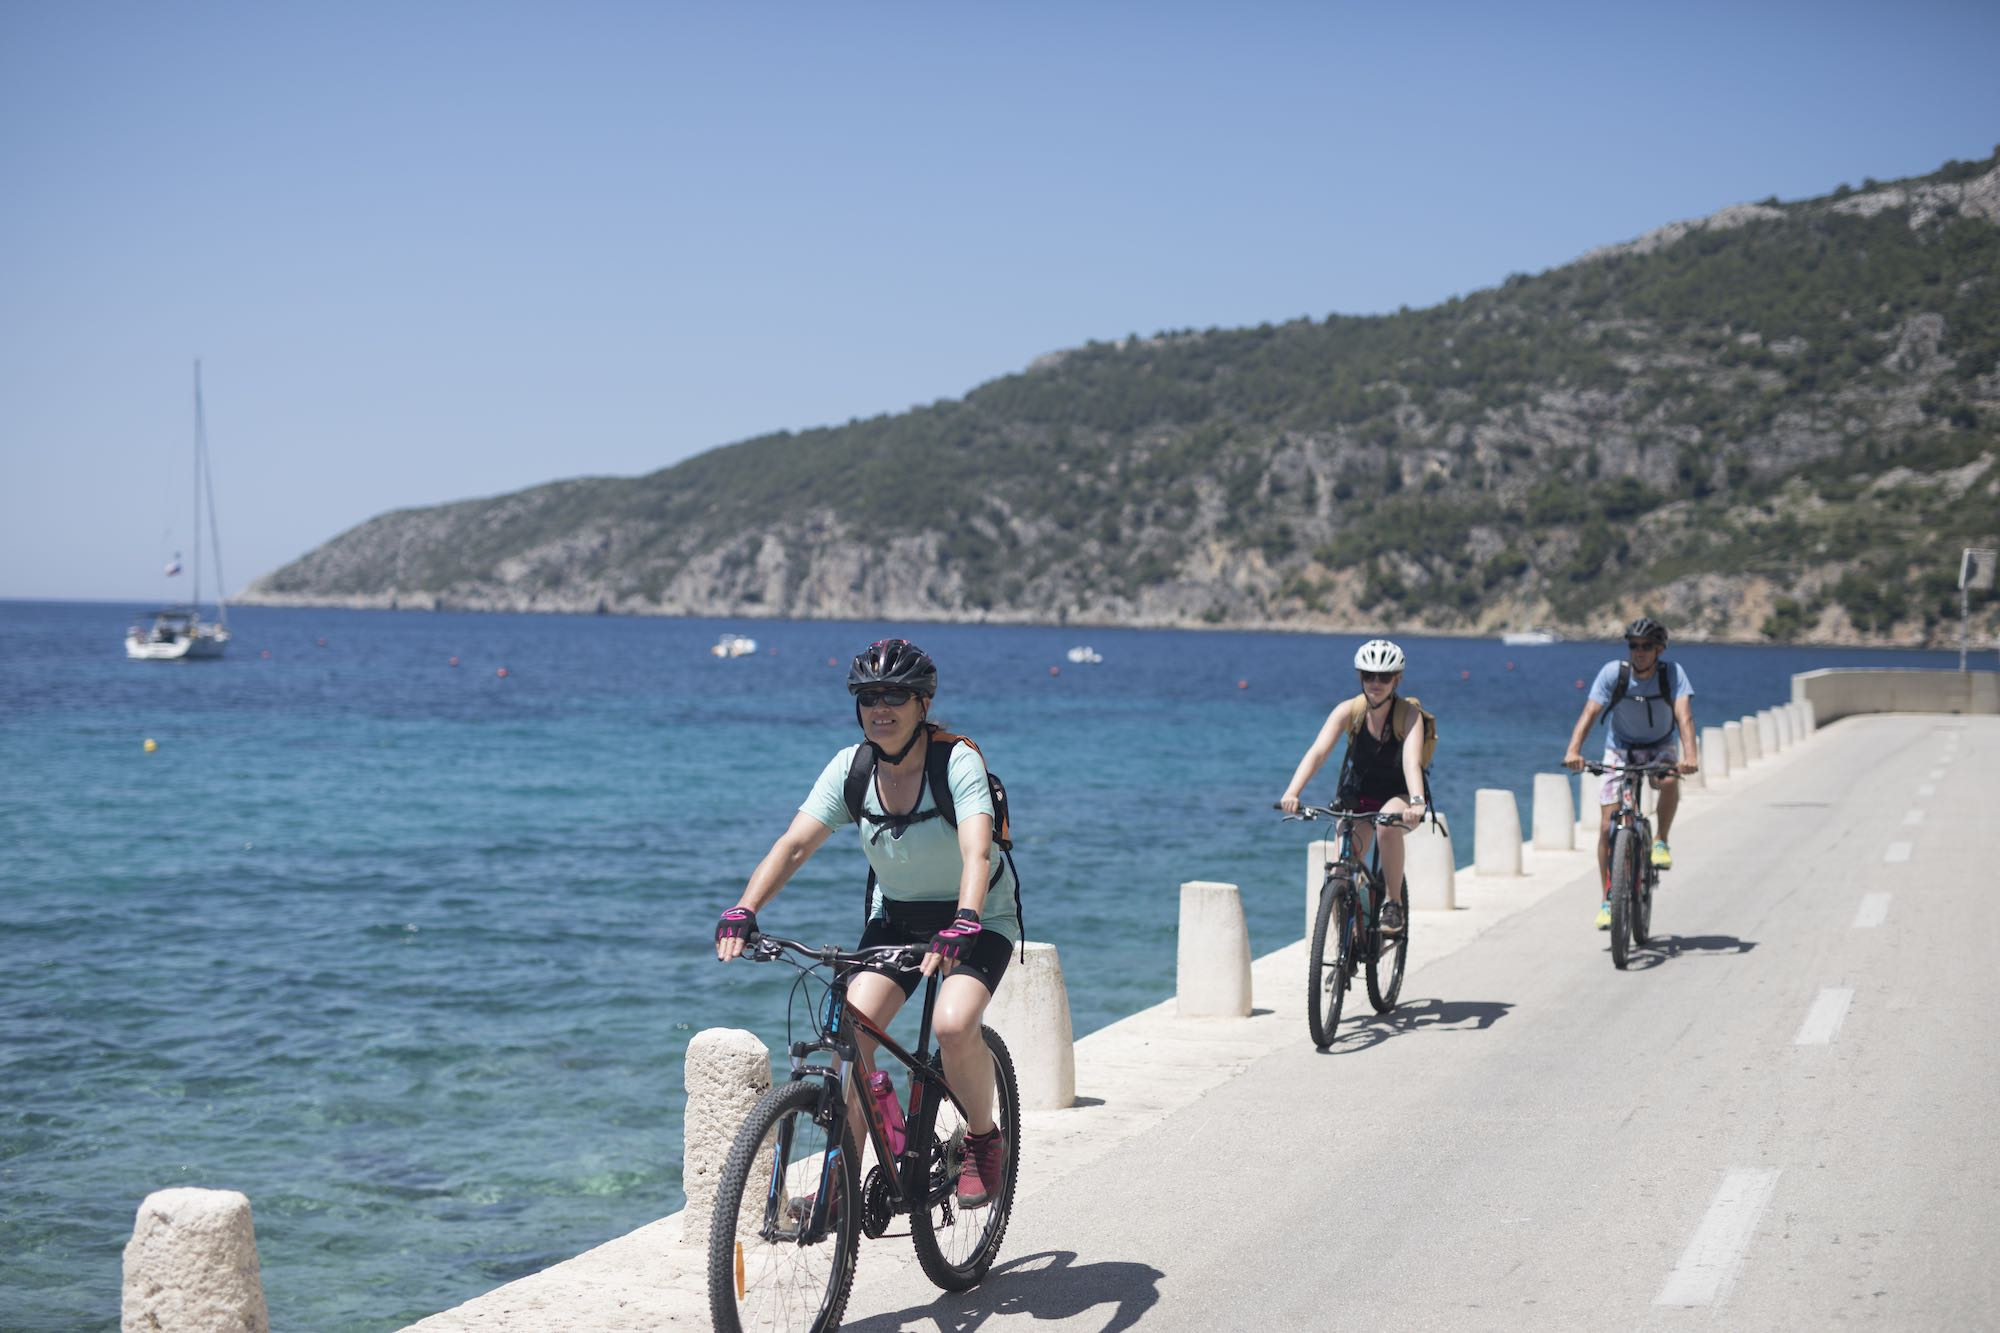 Biking in Komiza, Vis Island Croatia